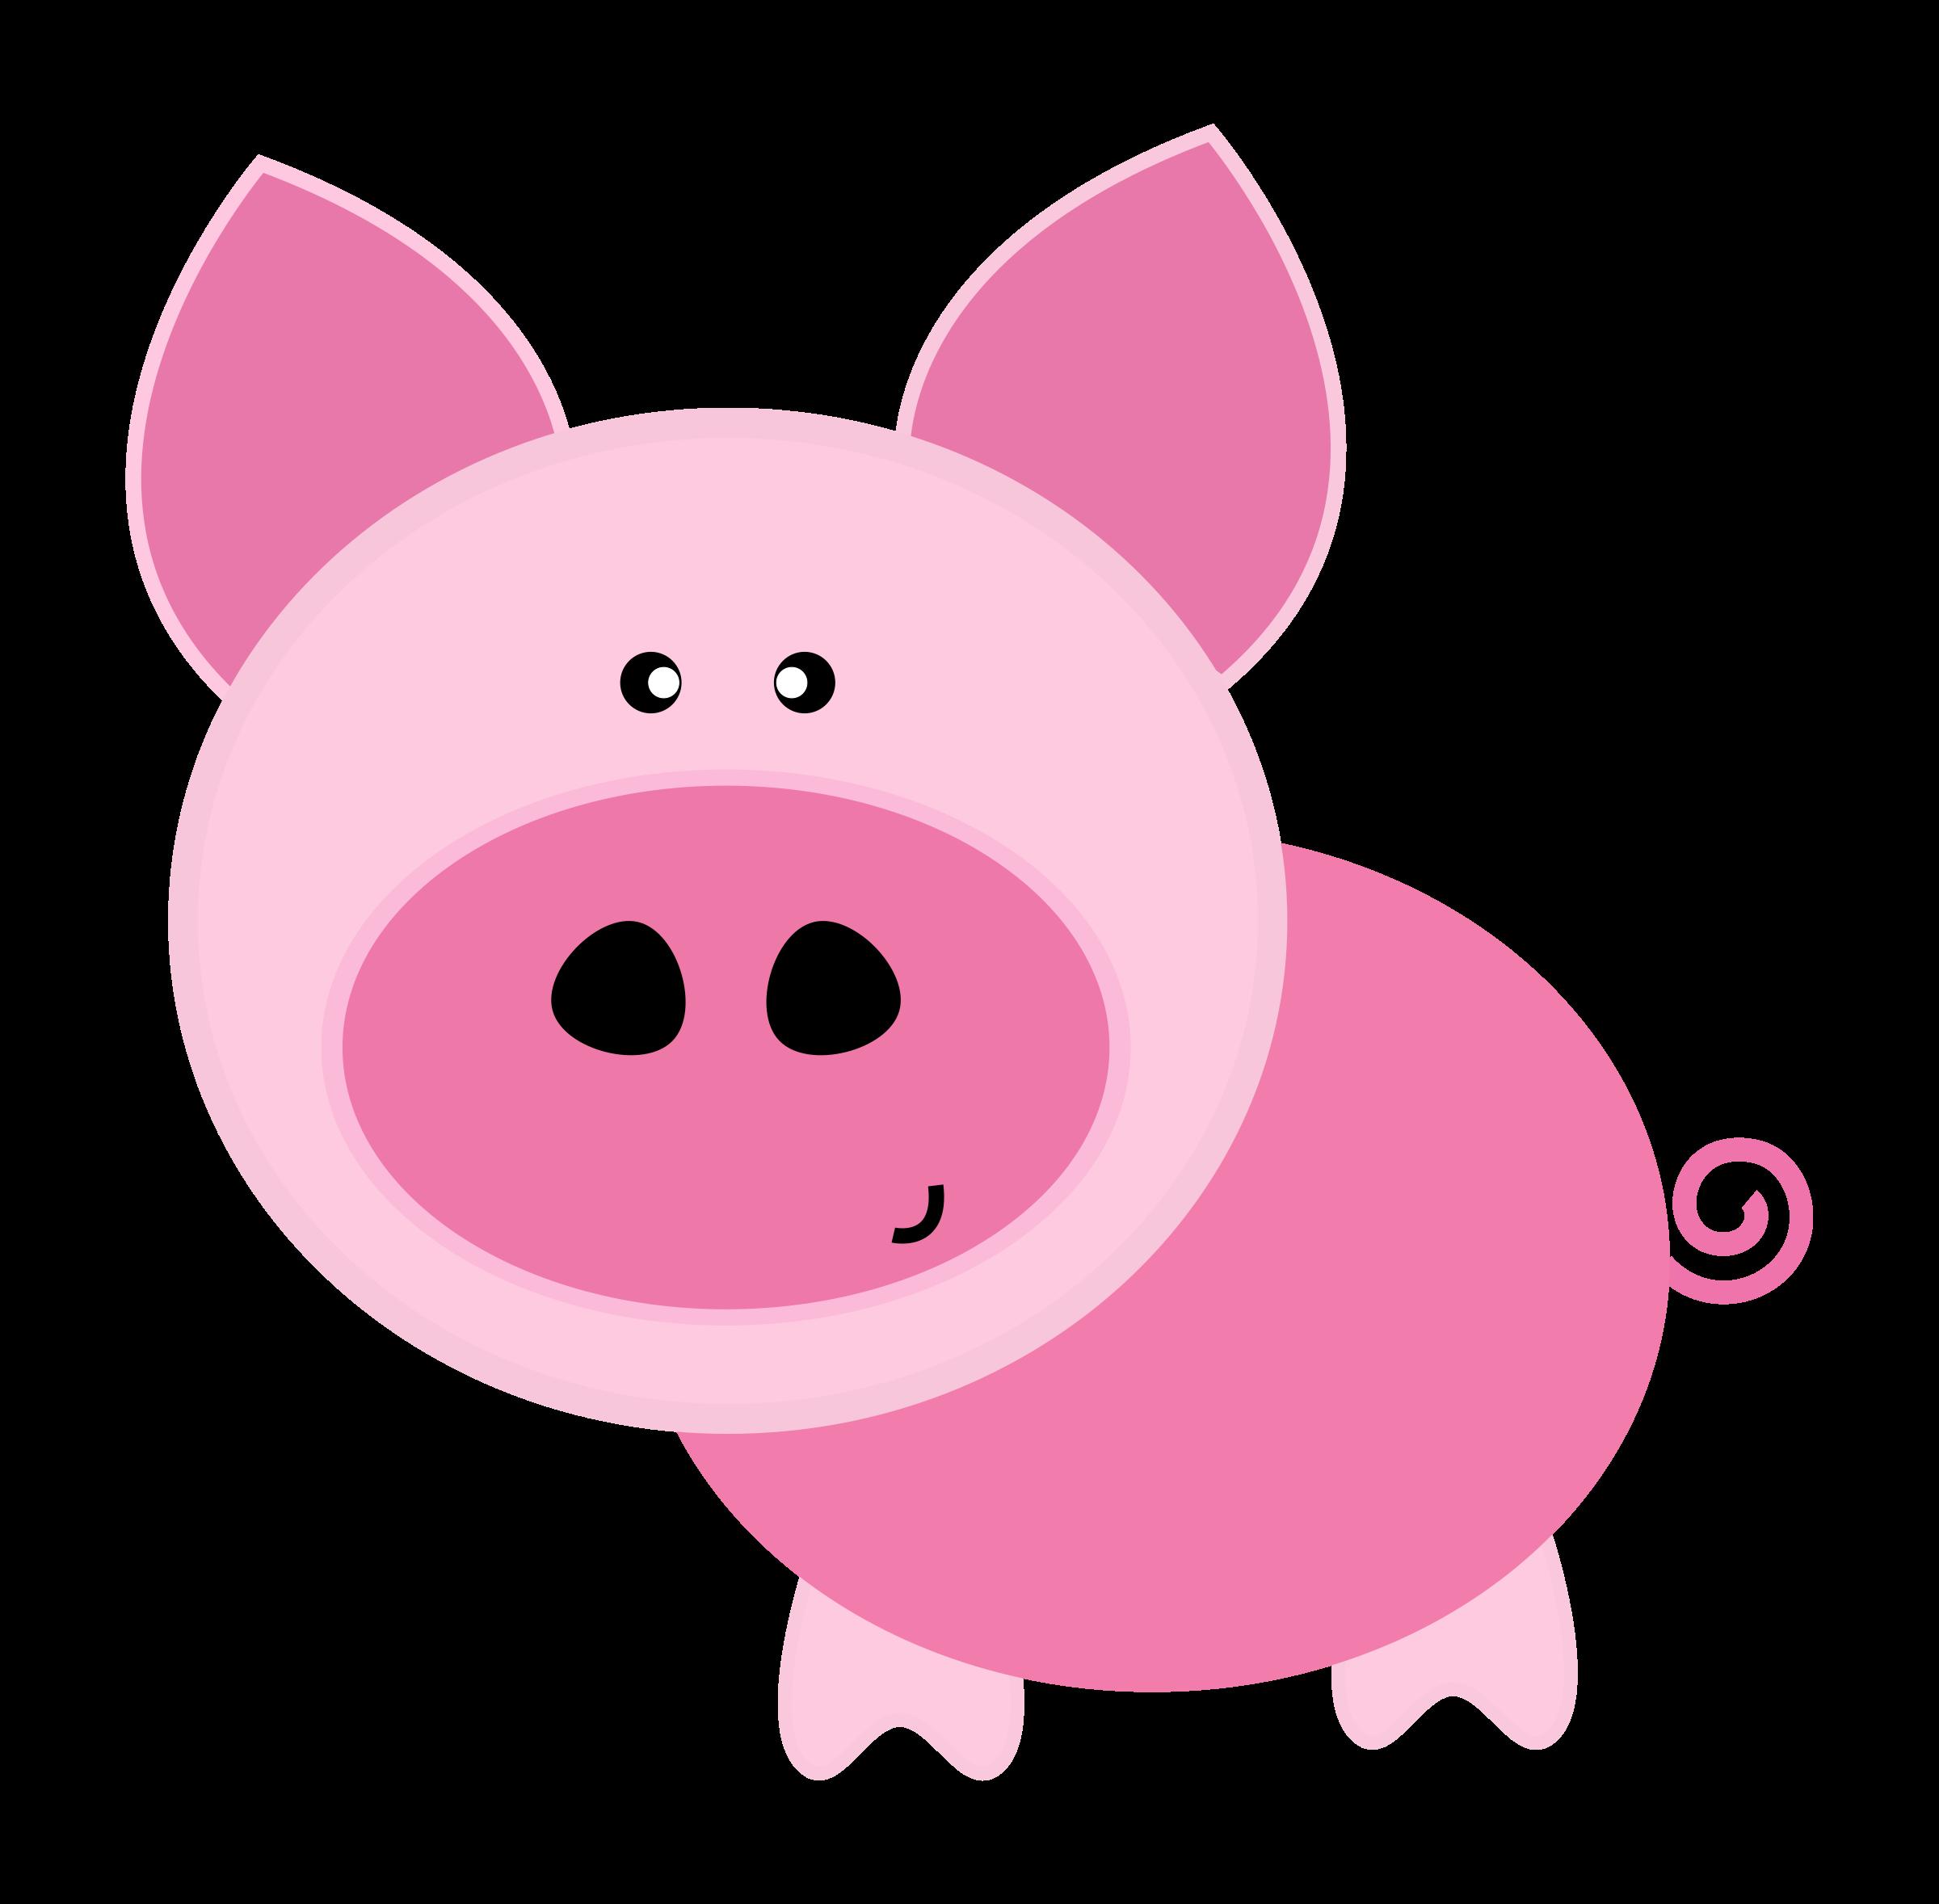 Pigs clipart swine. Pig big image png